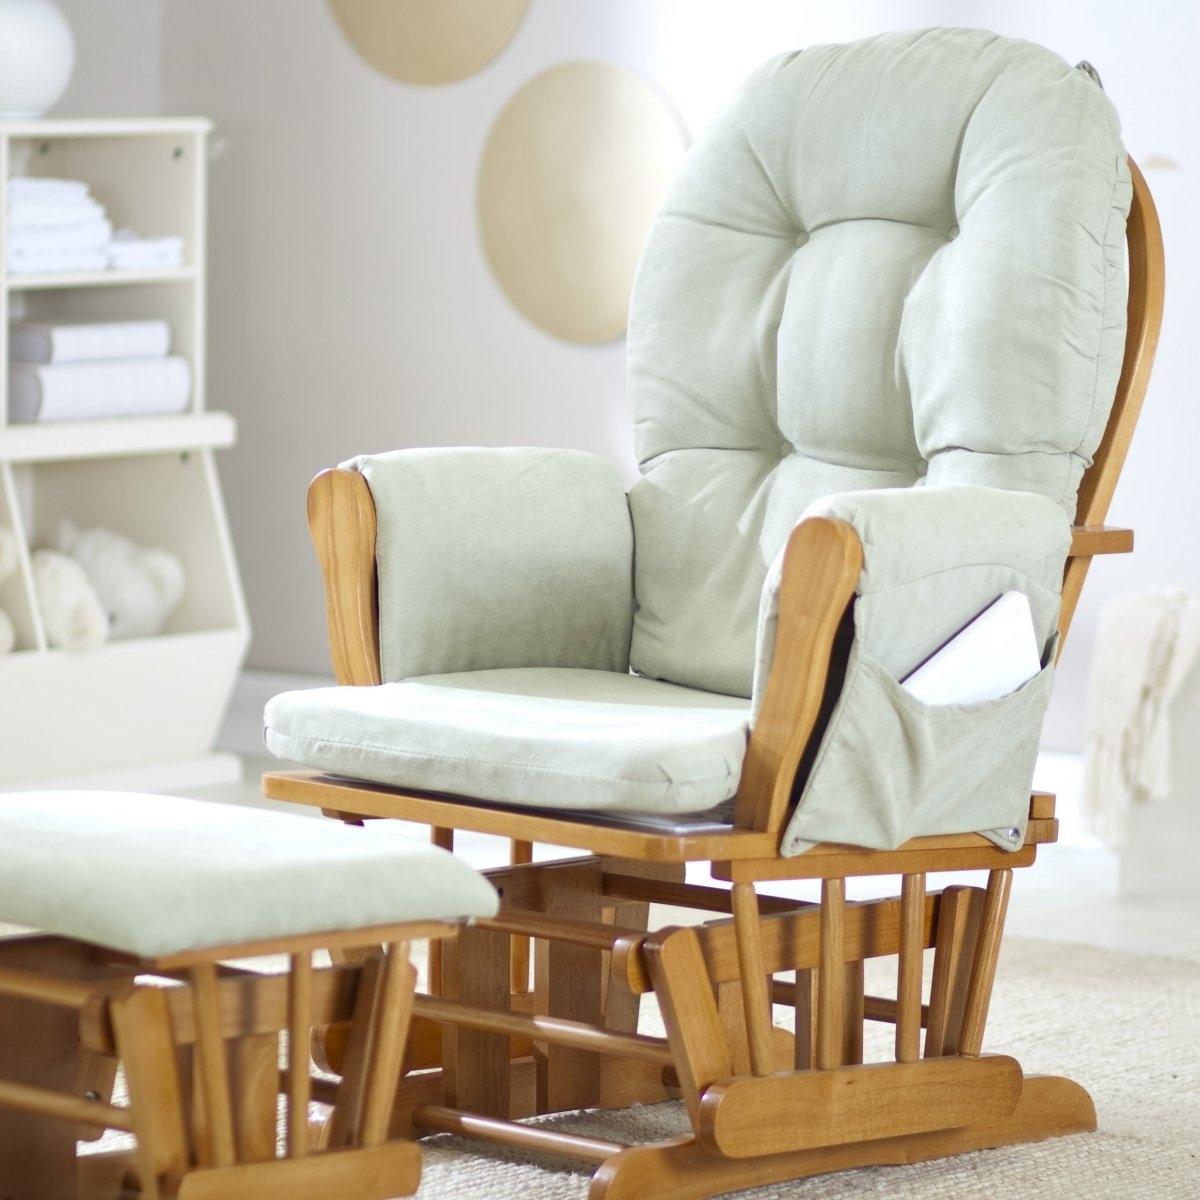 Famous Nursery Rocking Chair Target – Nursery Rocking Chair For Mom And Within Rocking Chairs For Nursery (View 2 of 15)